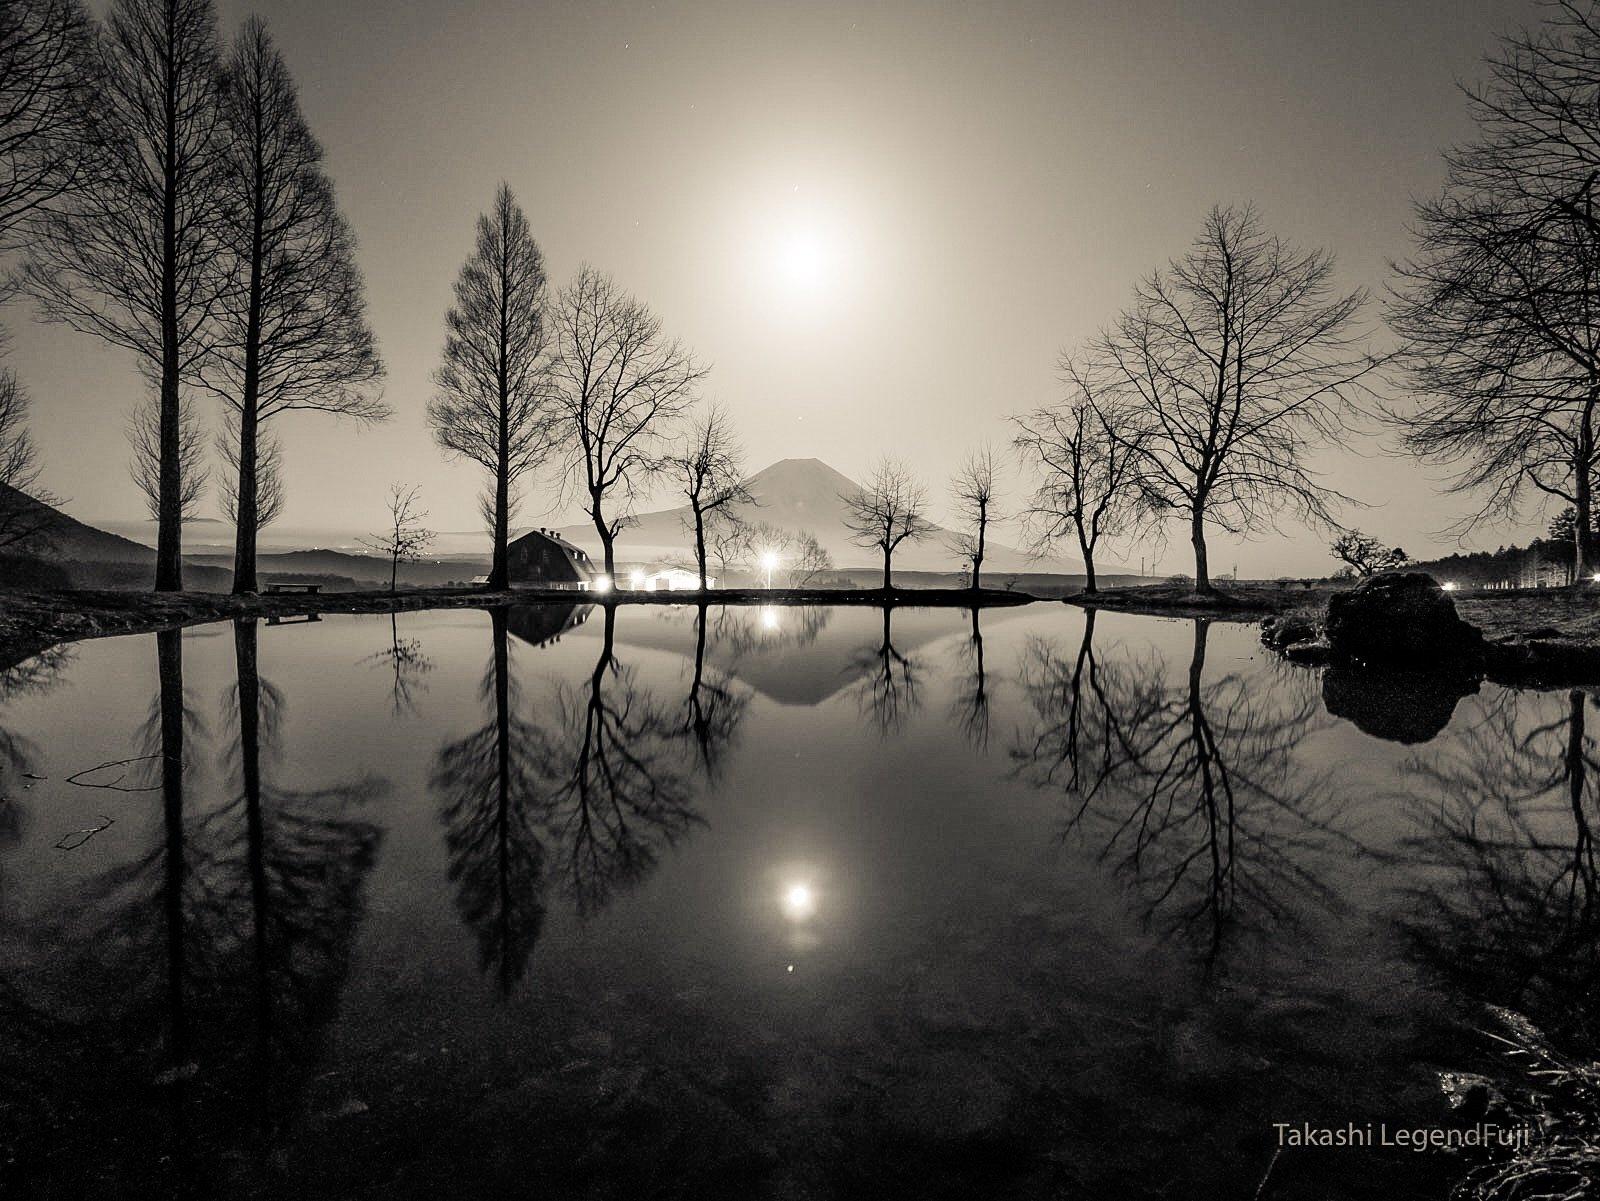 Fuji,mountain,night,tree,moon,Japan,water,reflection,beautiful,pond,lake,, Takashi